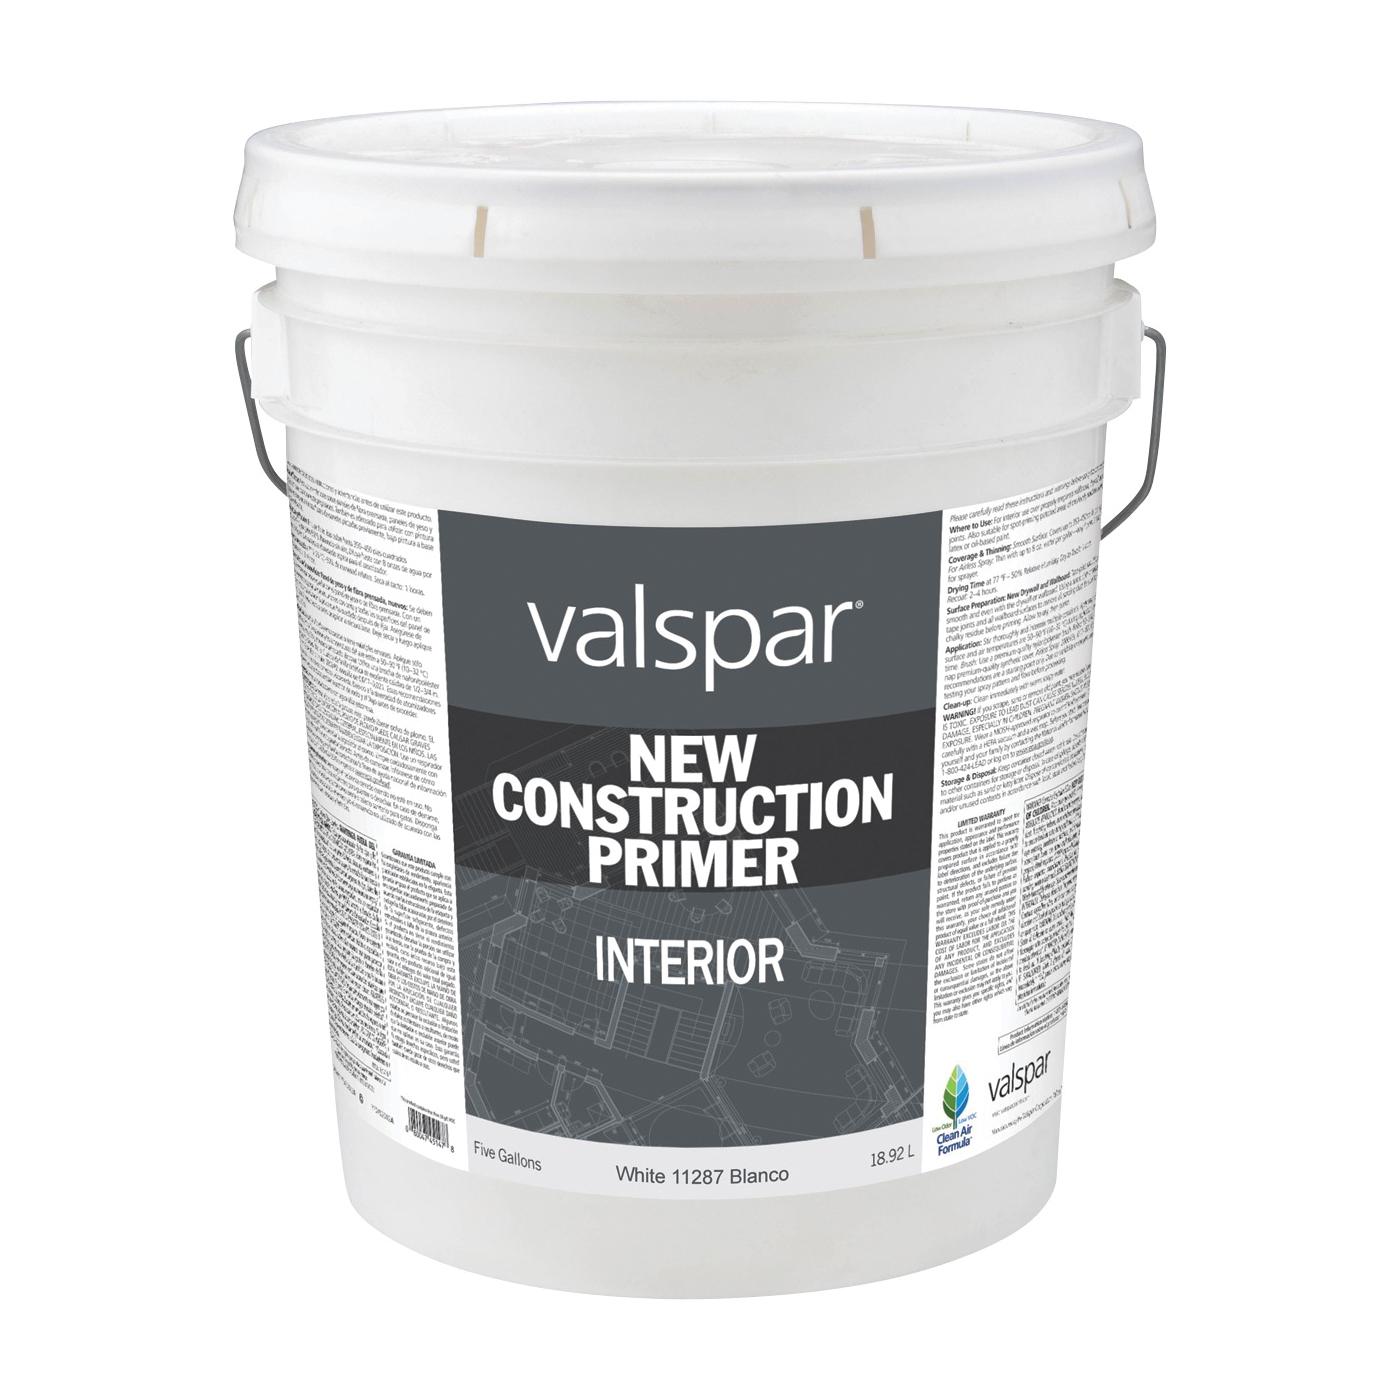 Picture of Valspar 11287 New Construction Primer, White, 5 gal, Pail